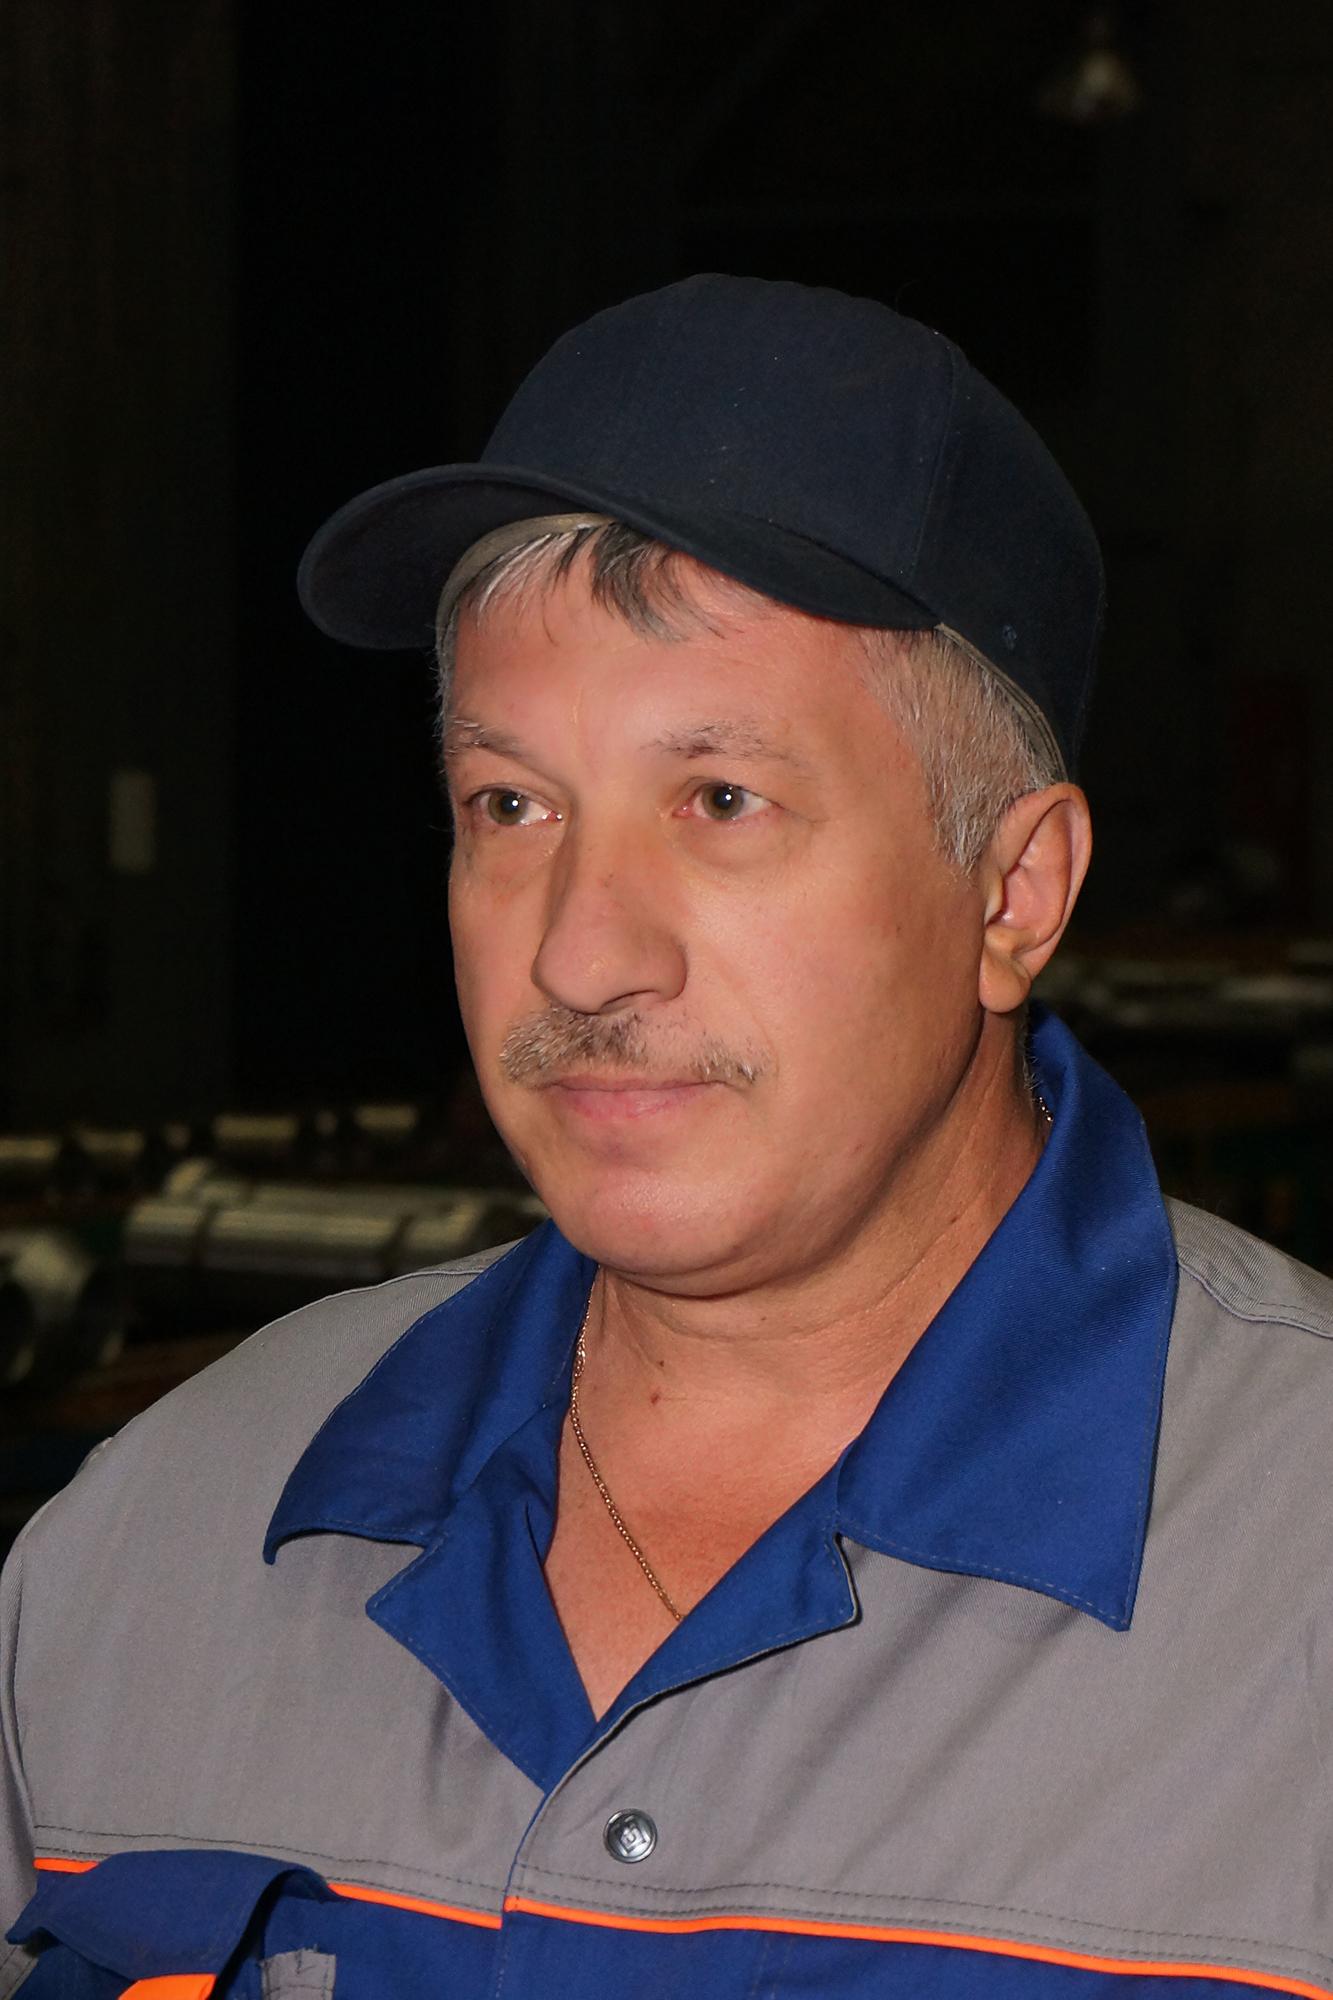 <strong>Александр Концевенко, бригадир токарей-расточников цеха №33.</strong><br /> На «Ижорских заводах» с 1980 года.<br />